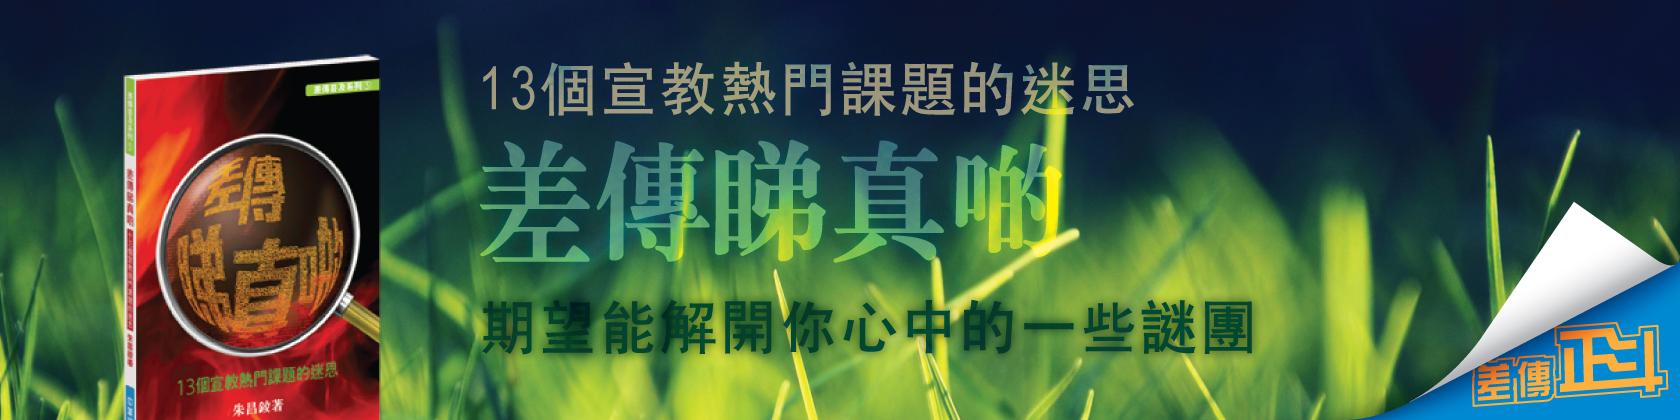 CB-01-web-banner-1680-x-420-B1-041